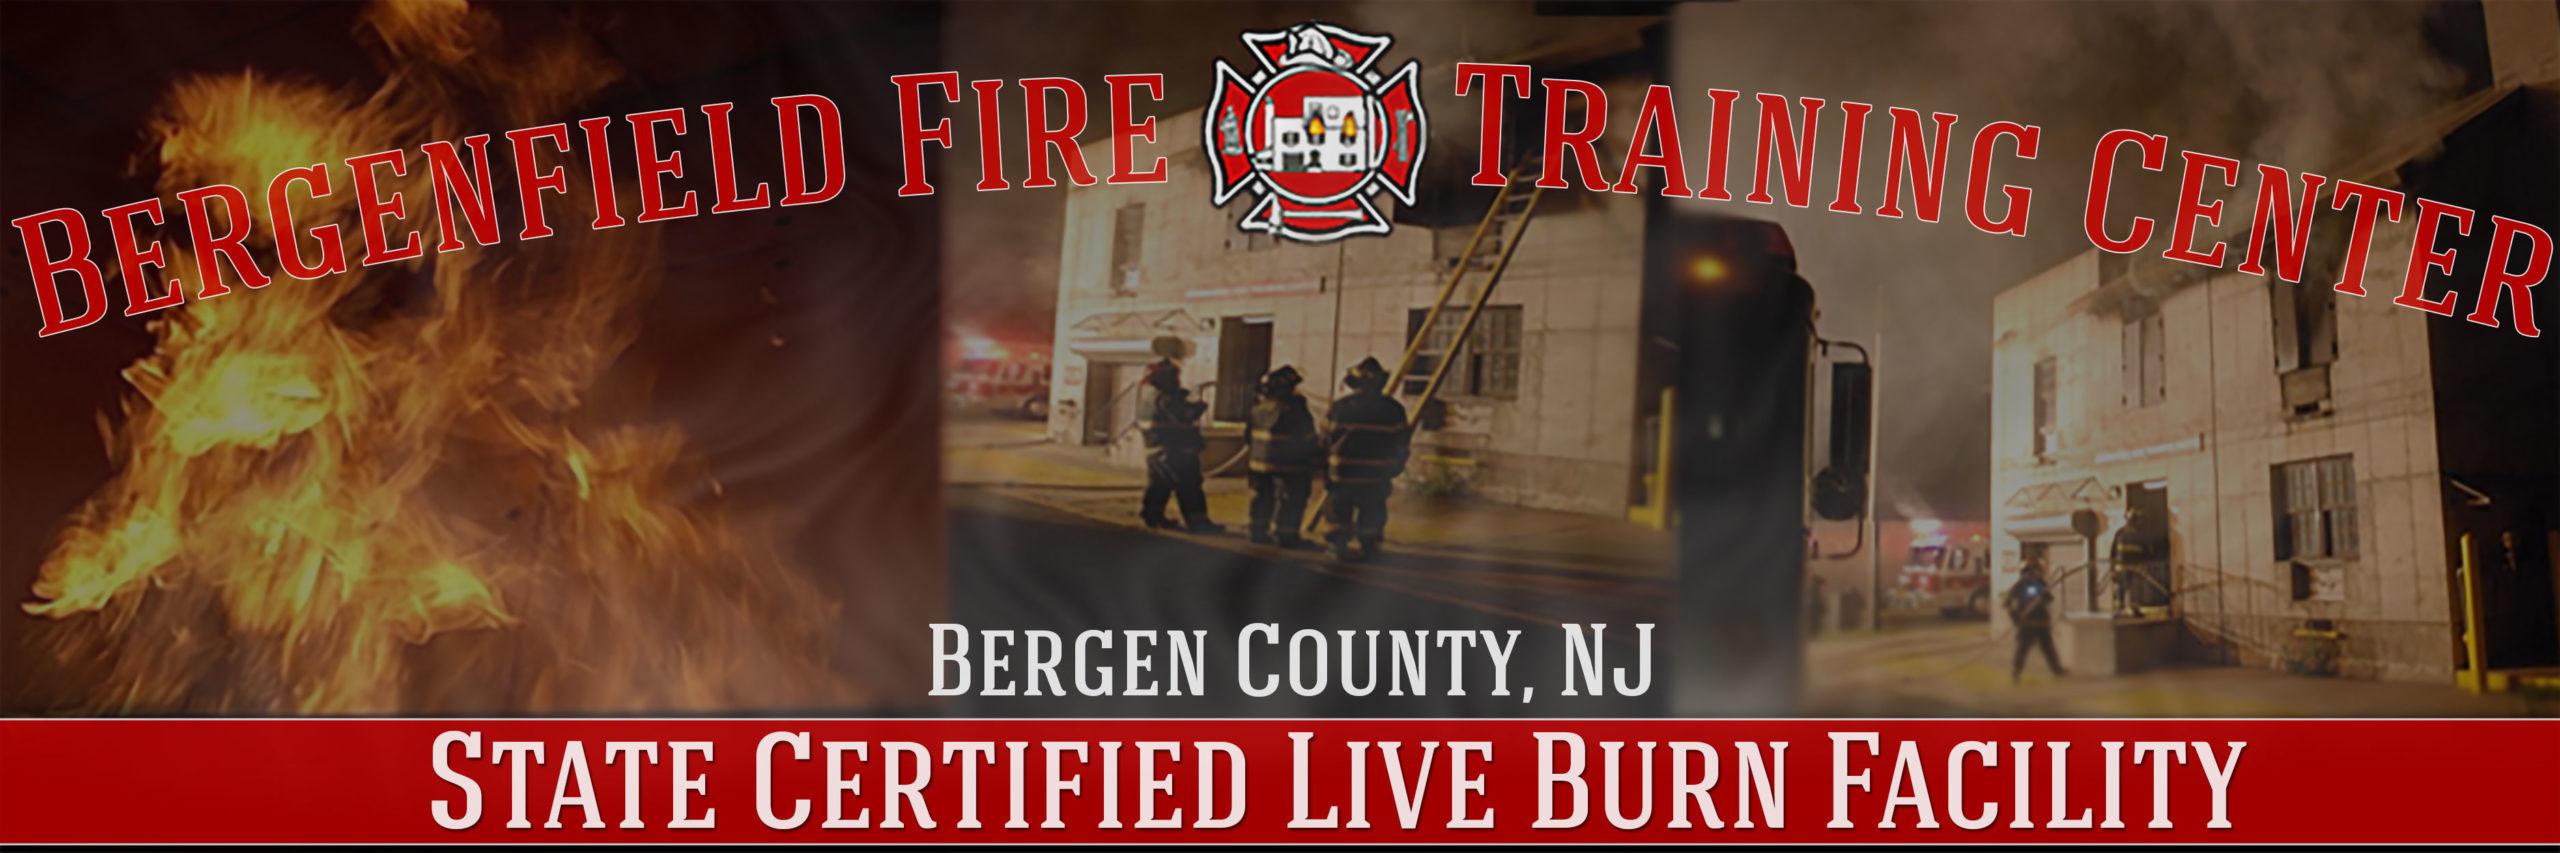 Bergenfield Fire Training Center